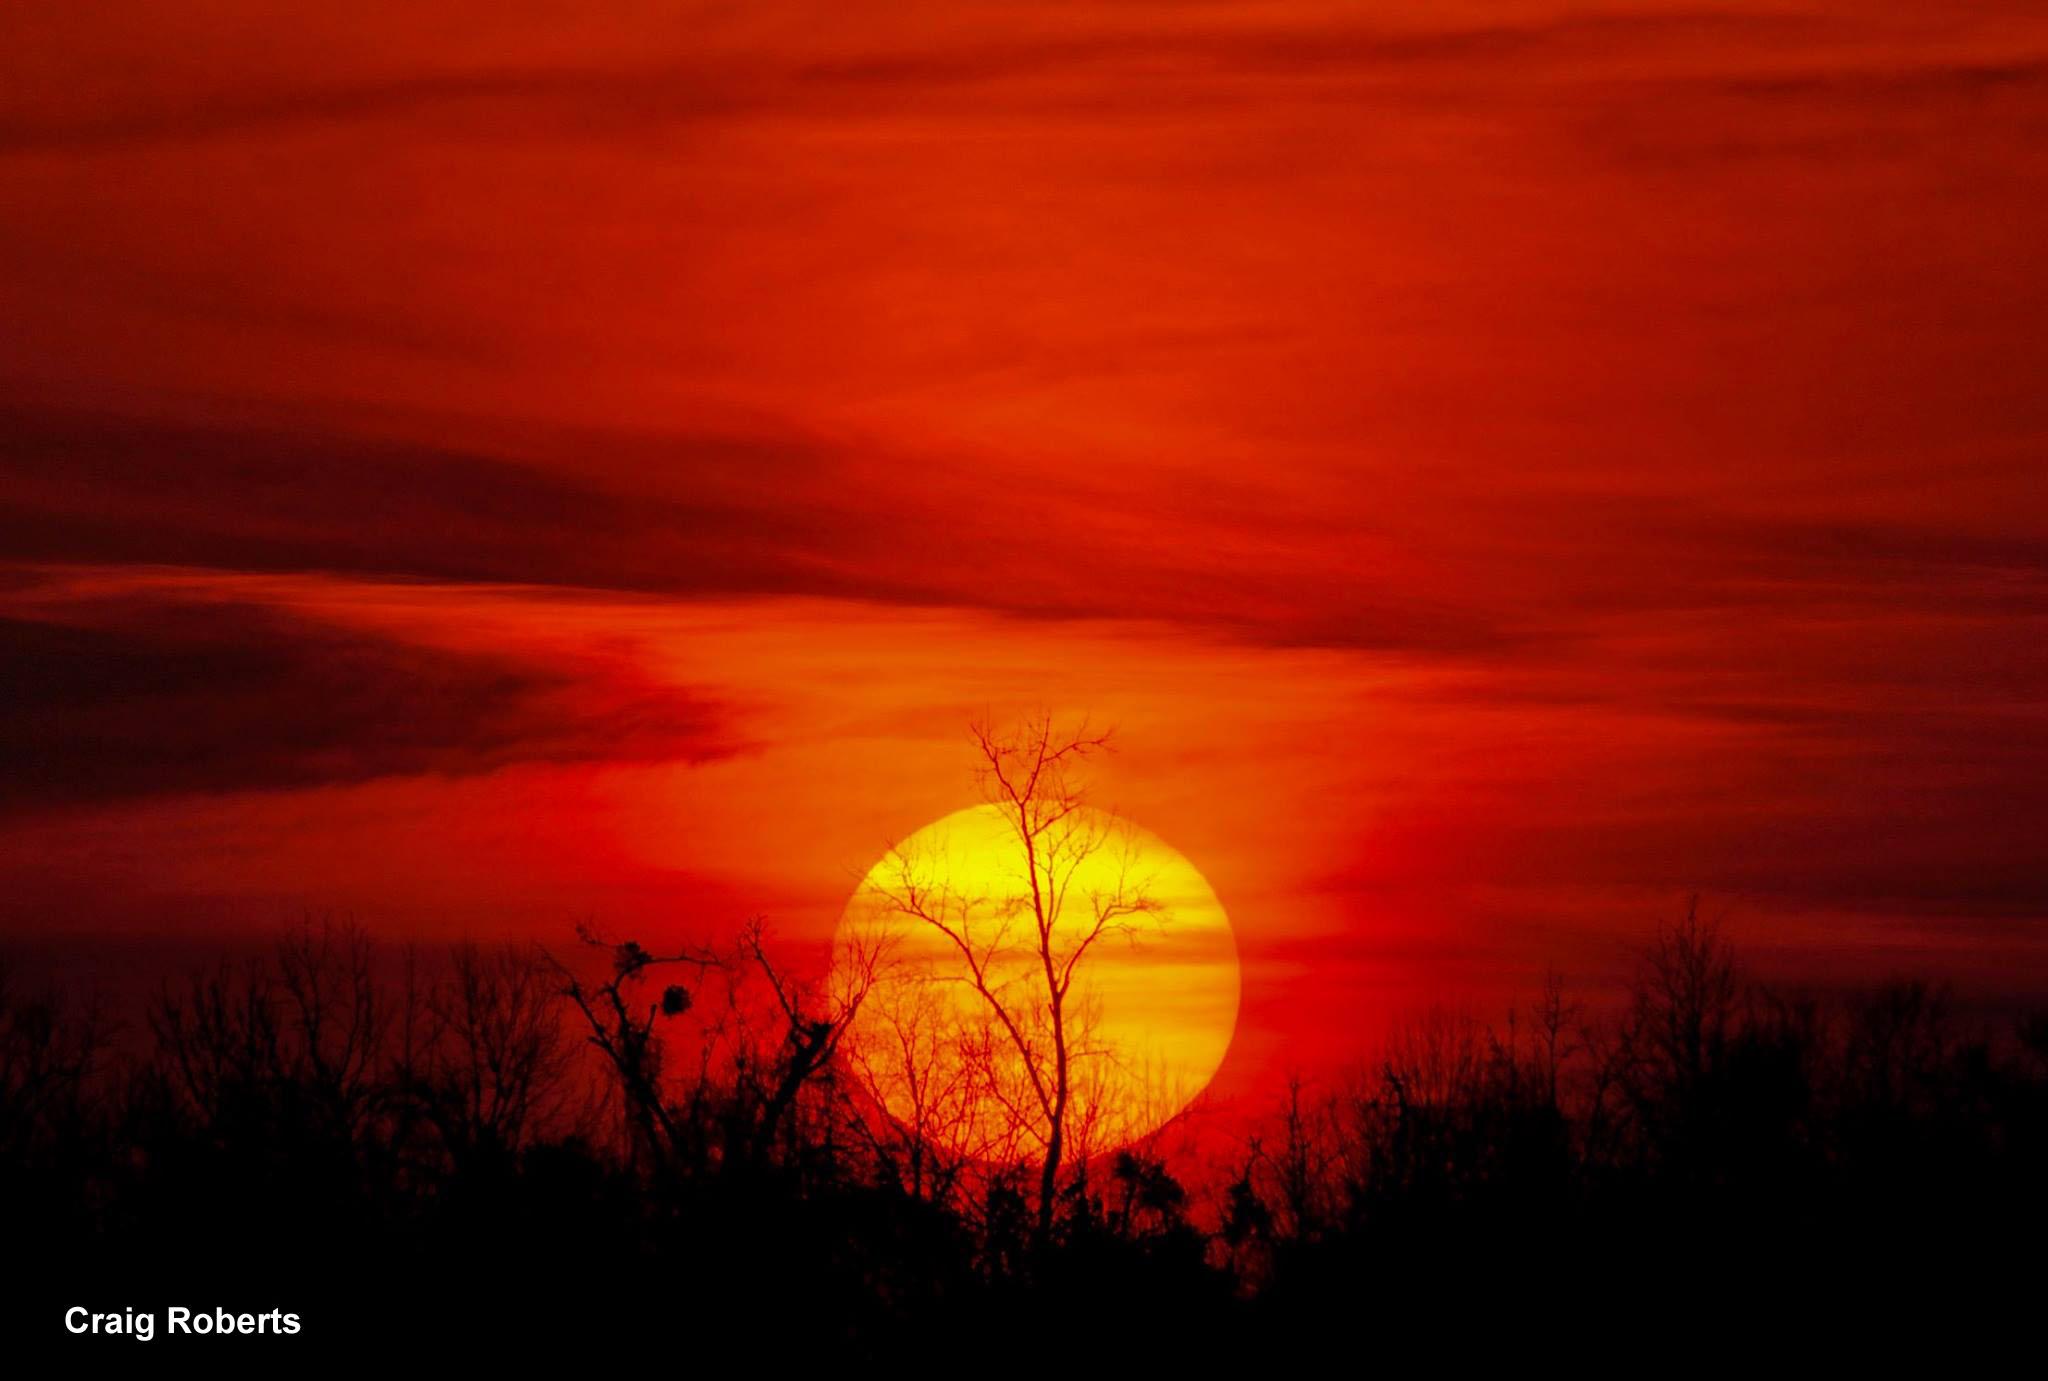 sun setting Craig Roberts_1516405898851.jpg.jpg